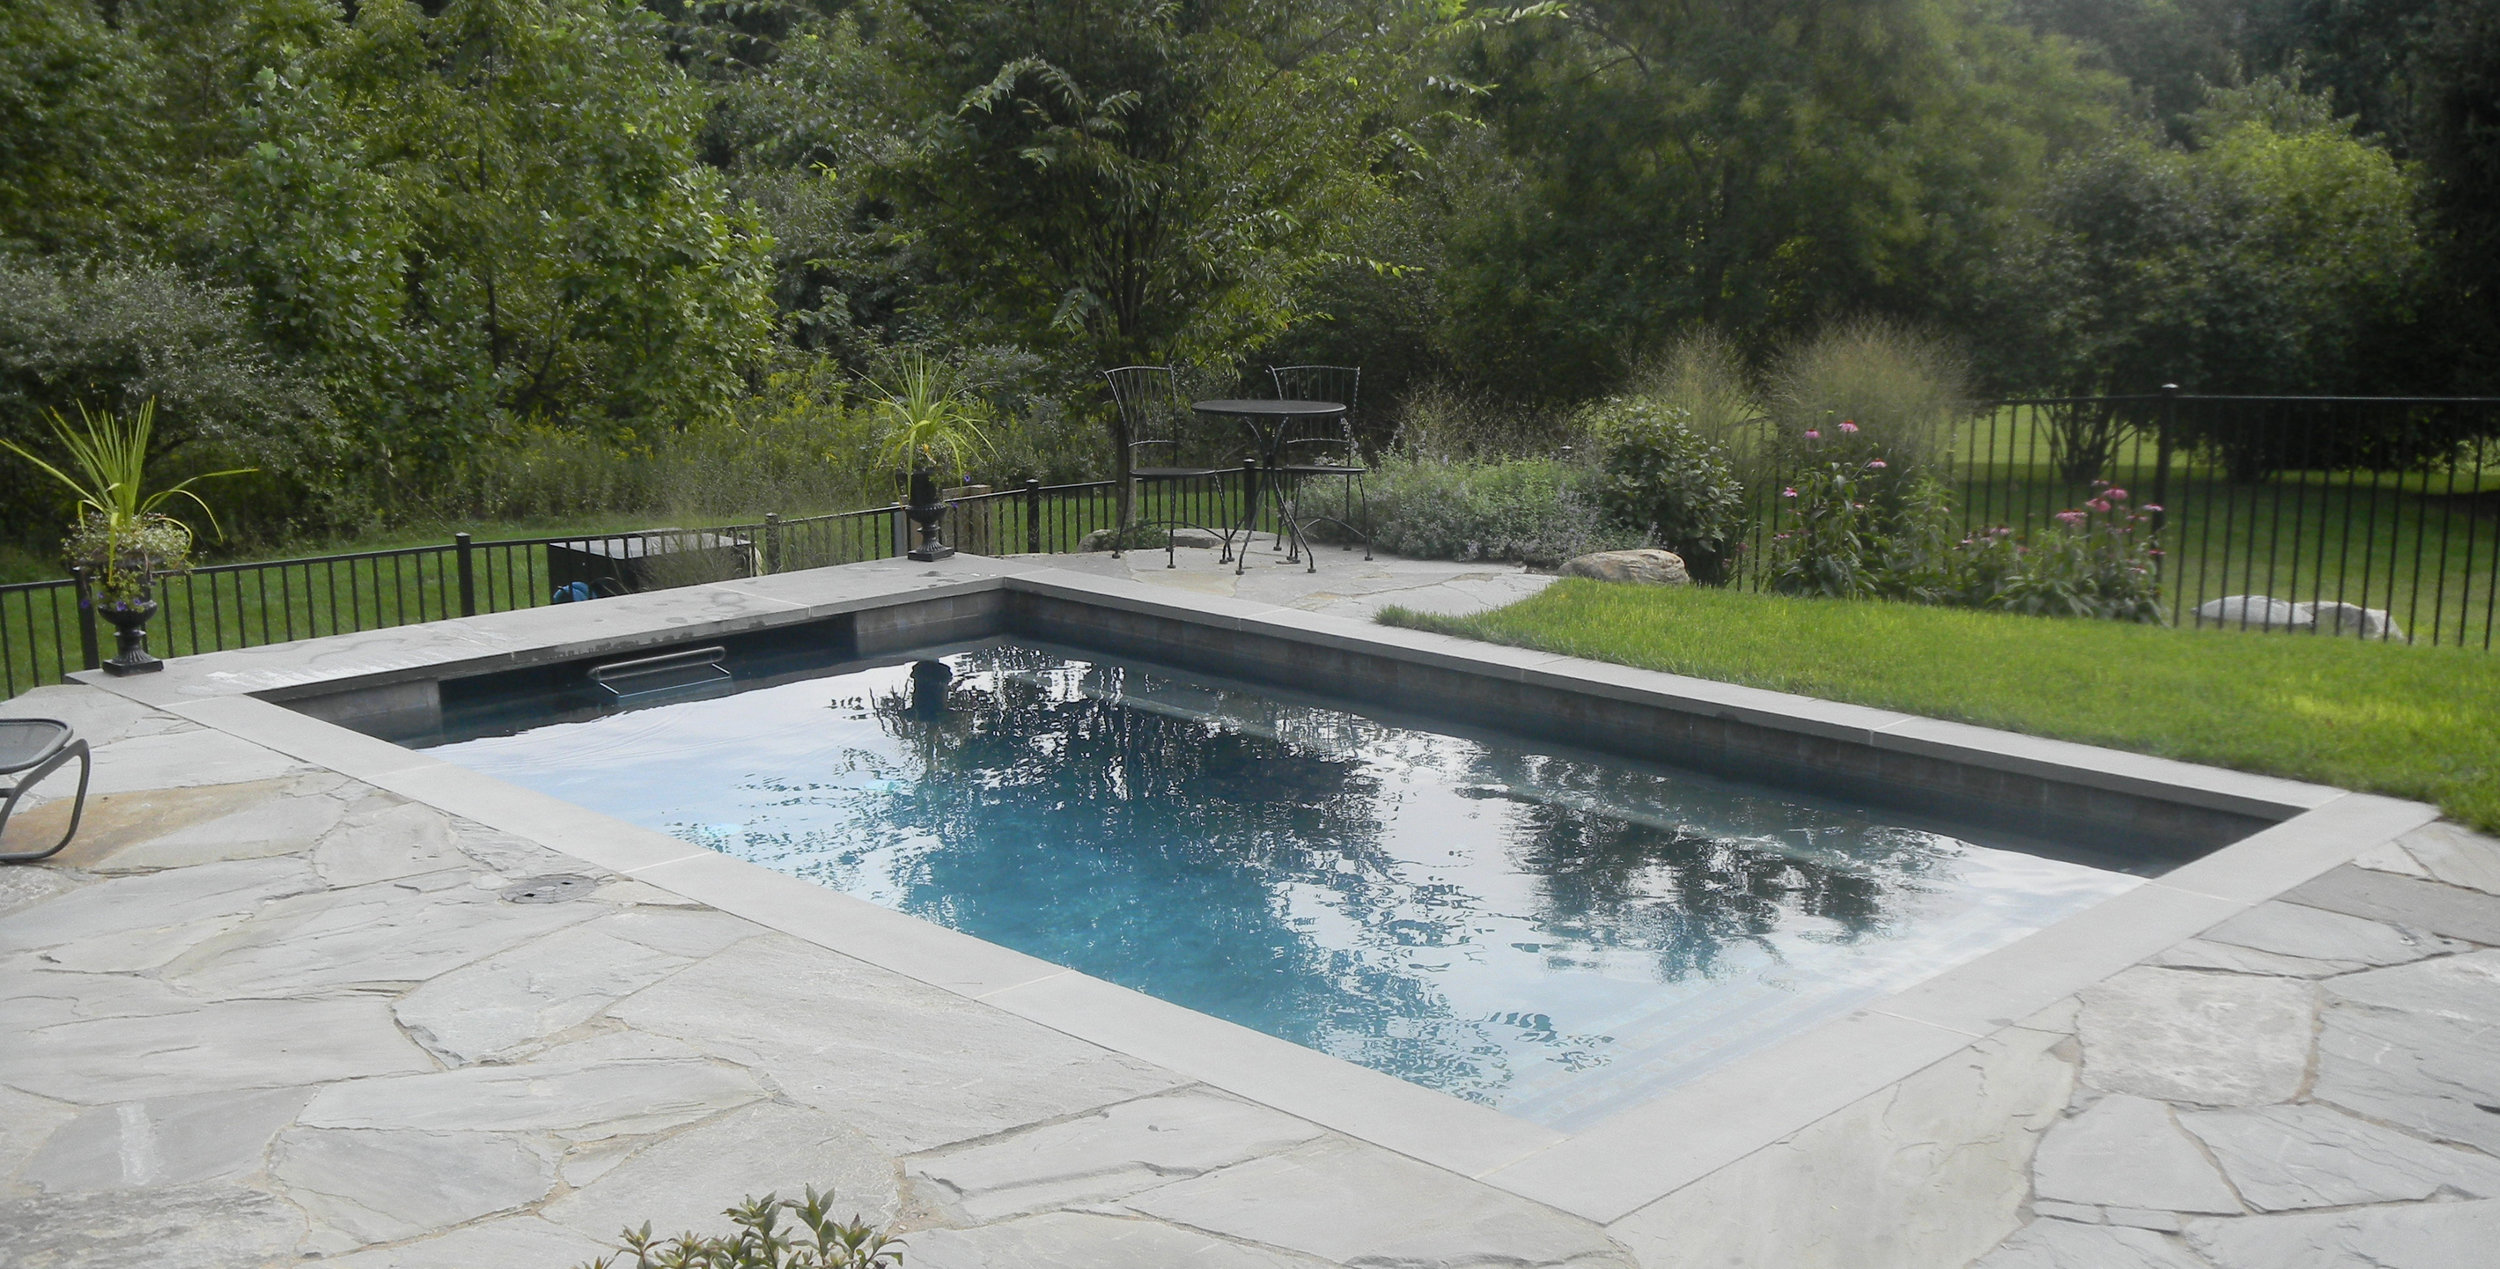 Pondworks_pool_recreation.JPG